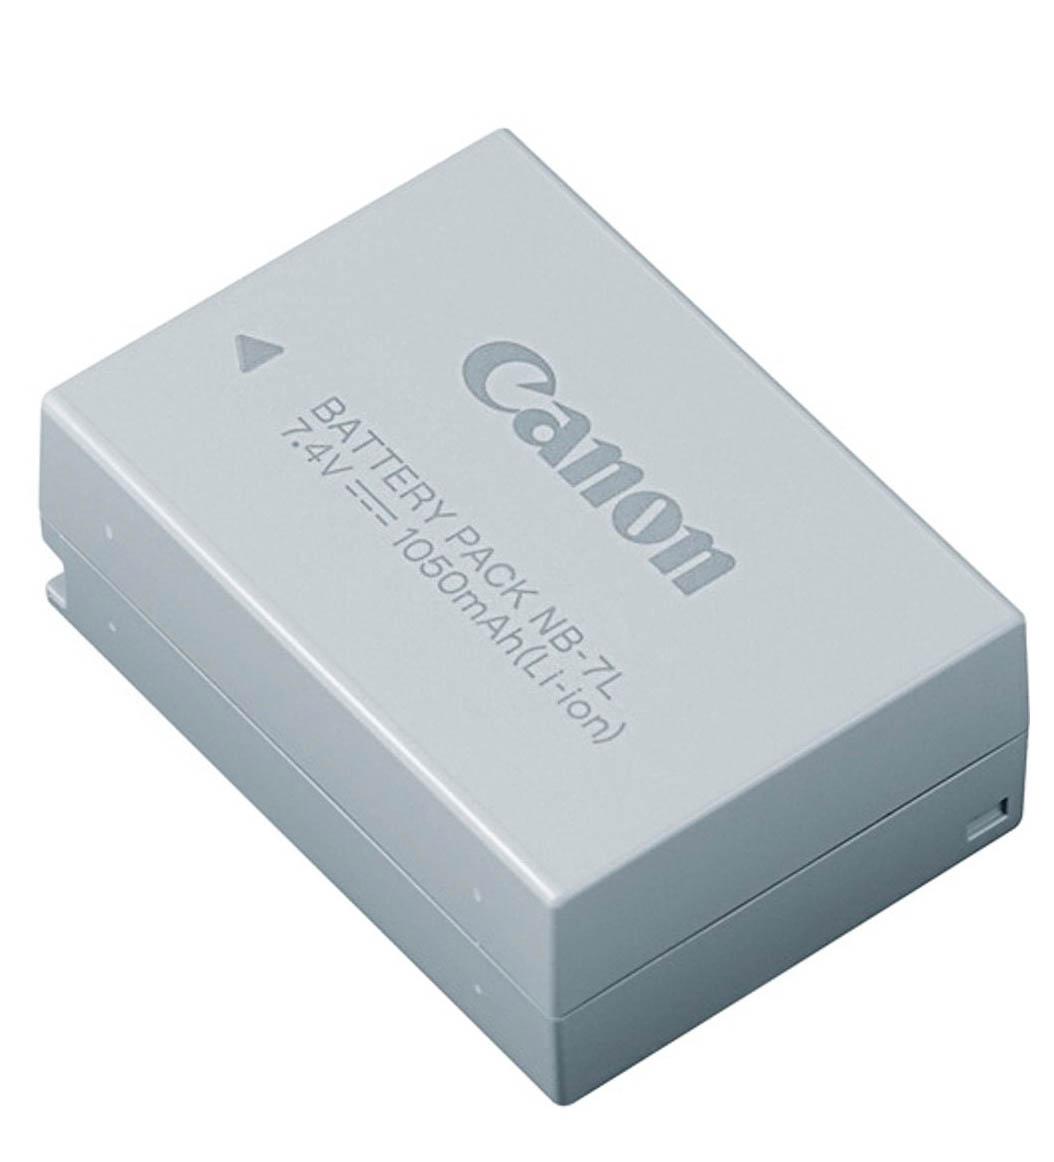 Canon Powershot G12 Battery